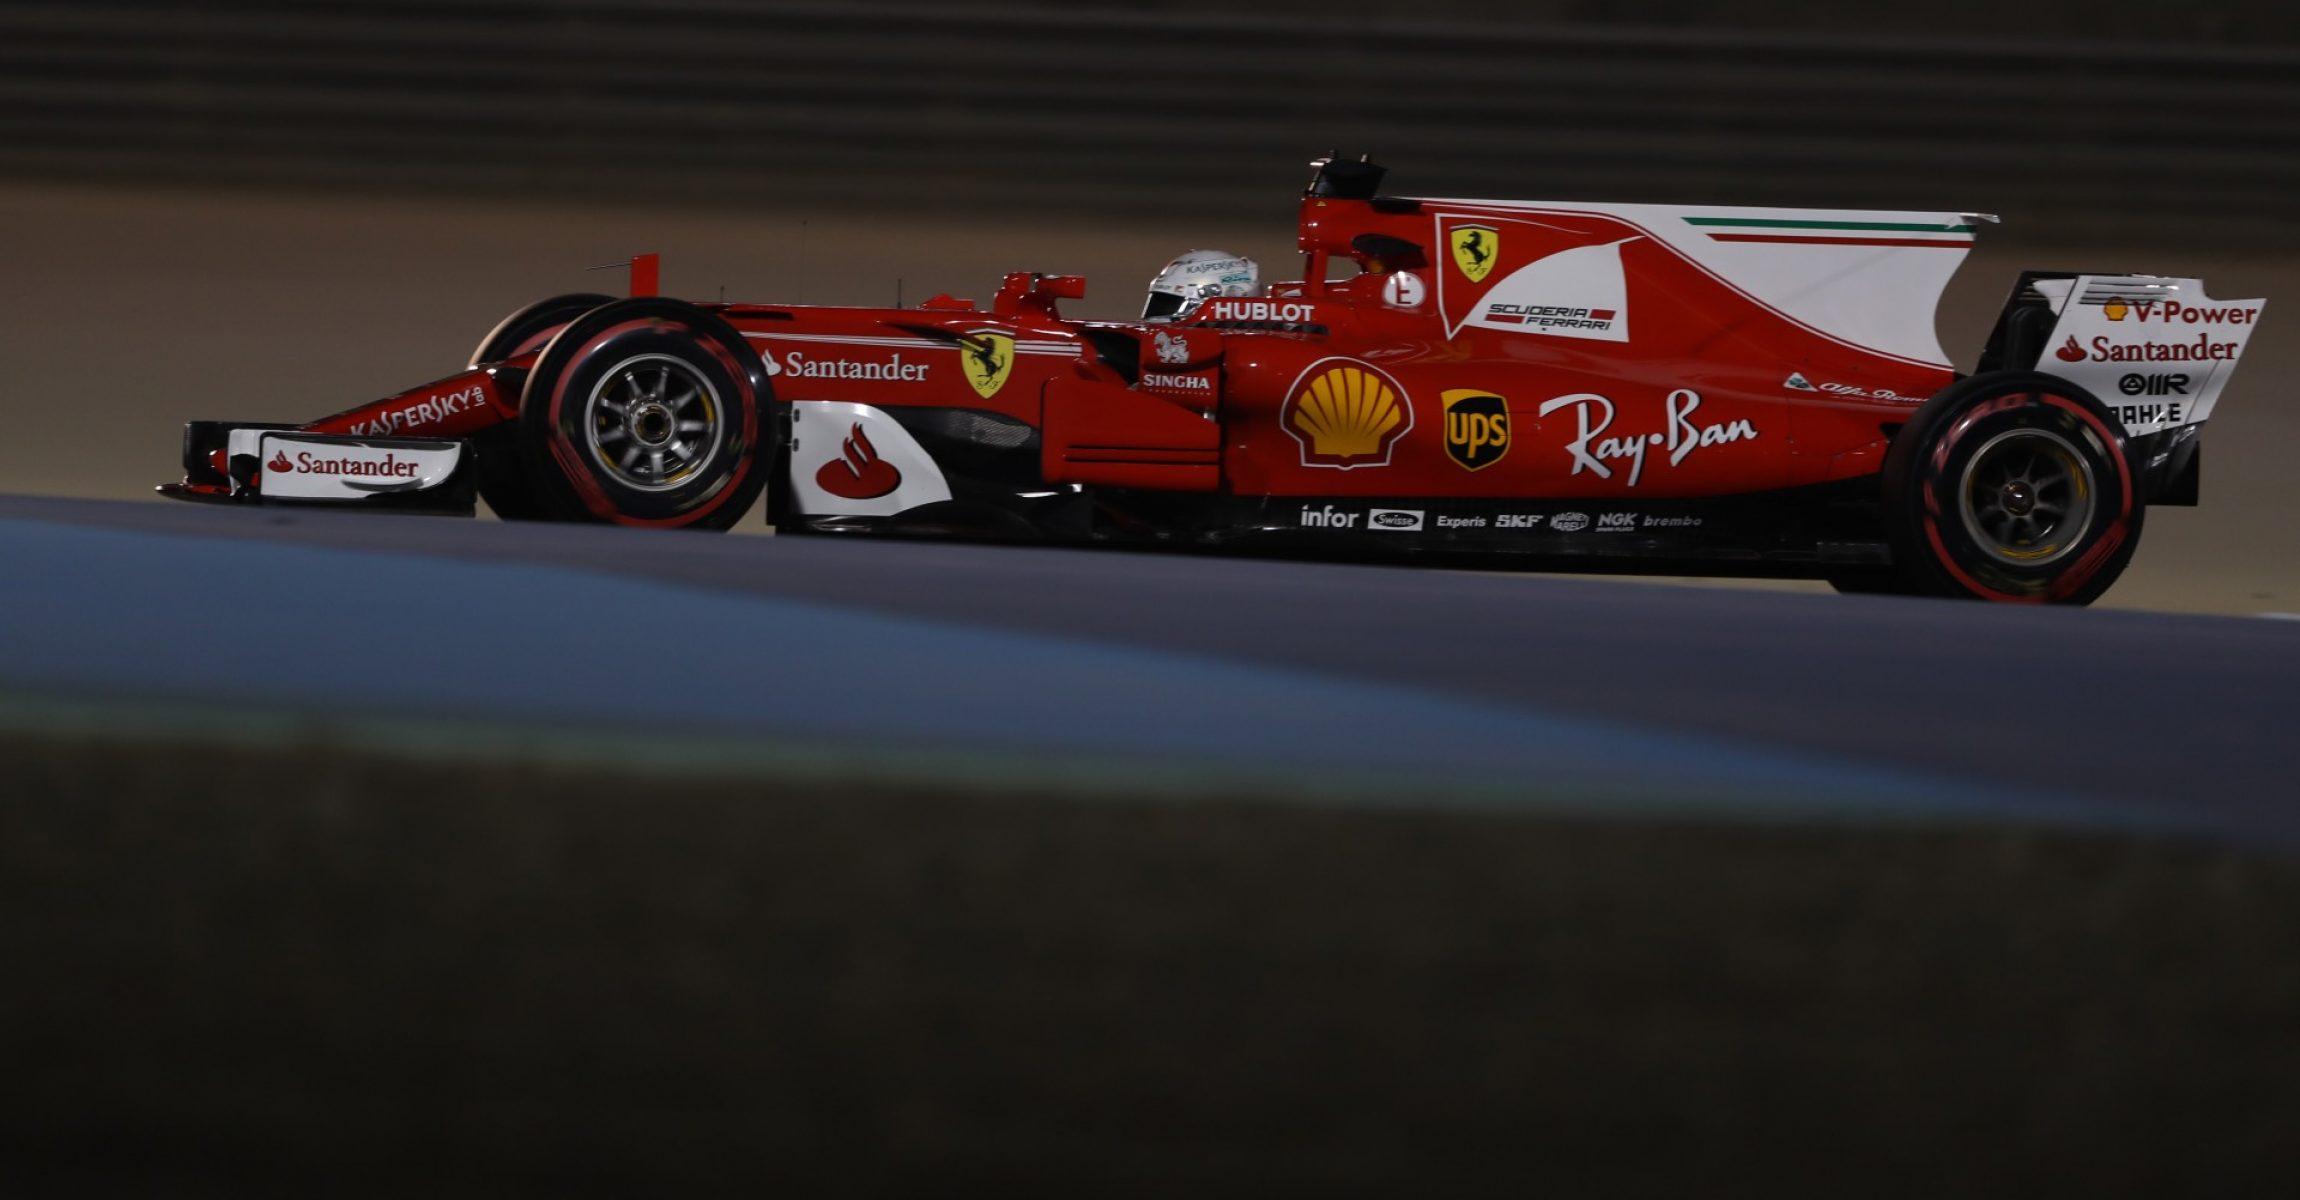 Bahrain Grand Prix Practice